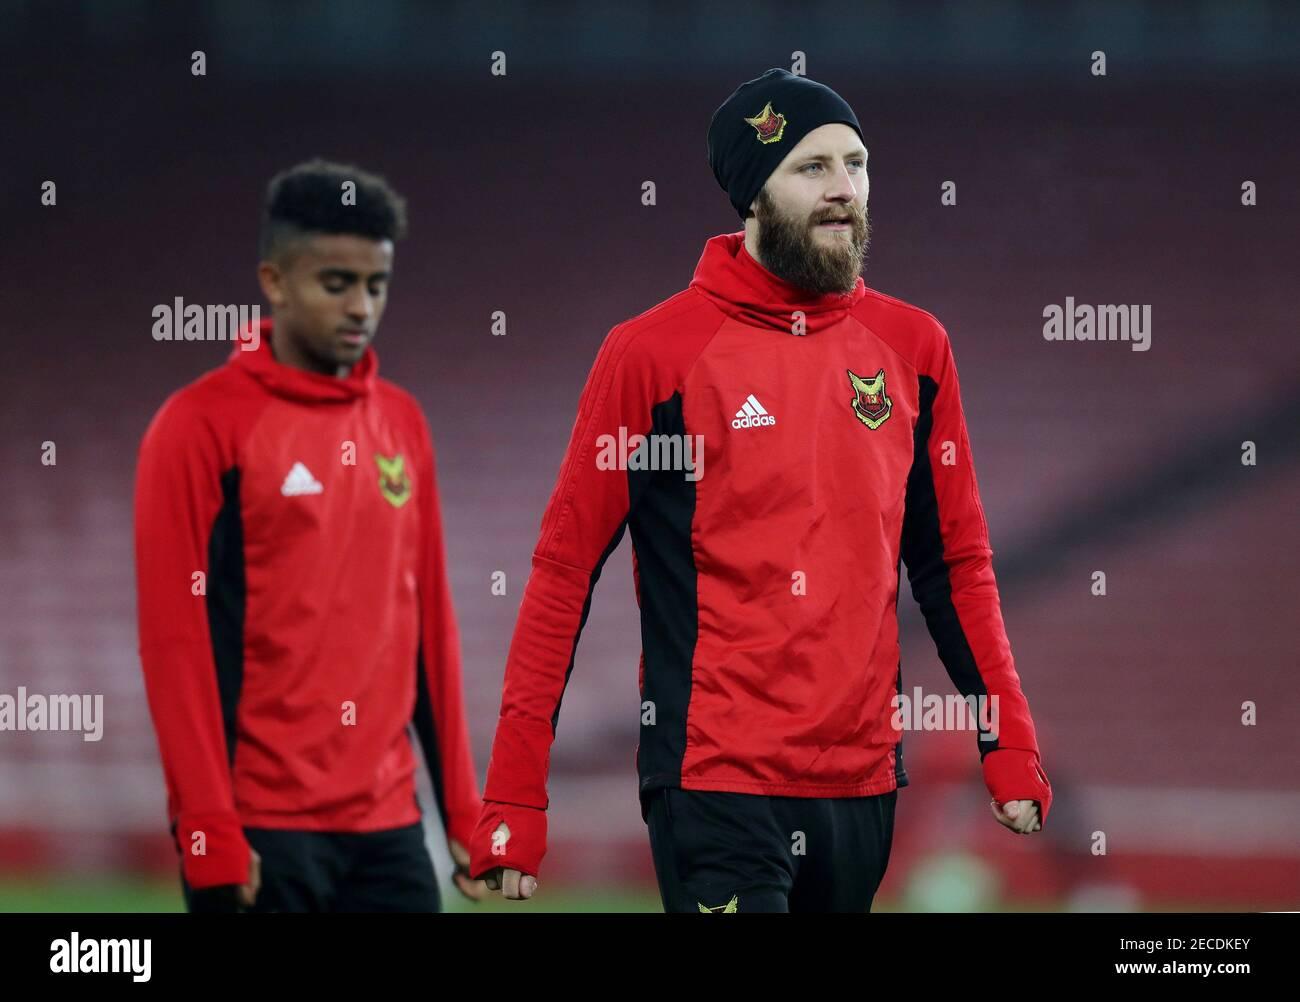 Fútbol - Liga Europea - Ostersunds FK Training - Emirates Stadium, Londres, Gran Bretaña - 21 de febrero de 2018 Ostersunds FK's Curtis Edwards durante el entrenamiento Action Images via Reuters/Peter Cziborra Foto de stock